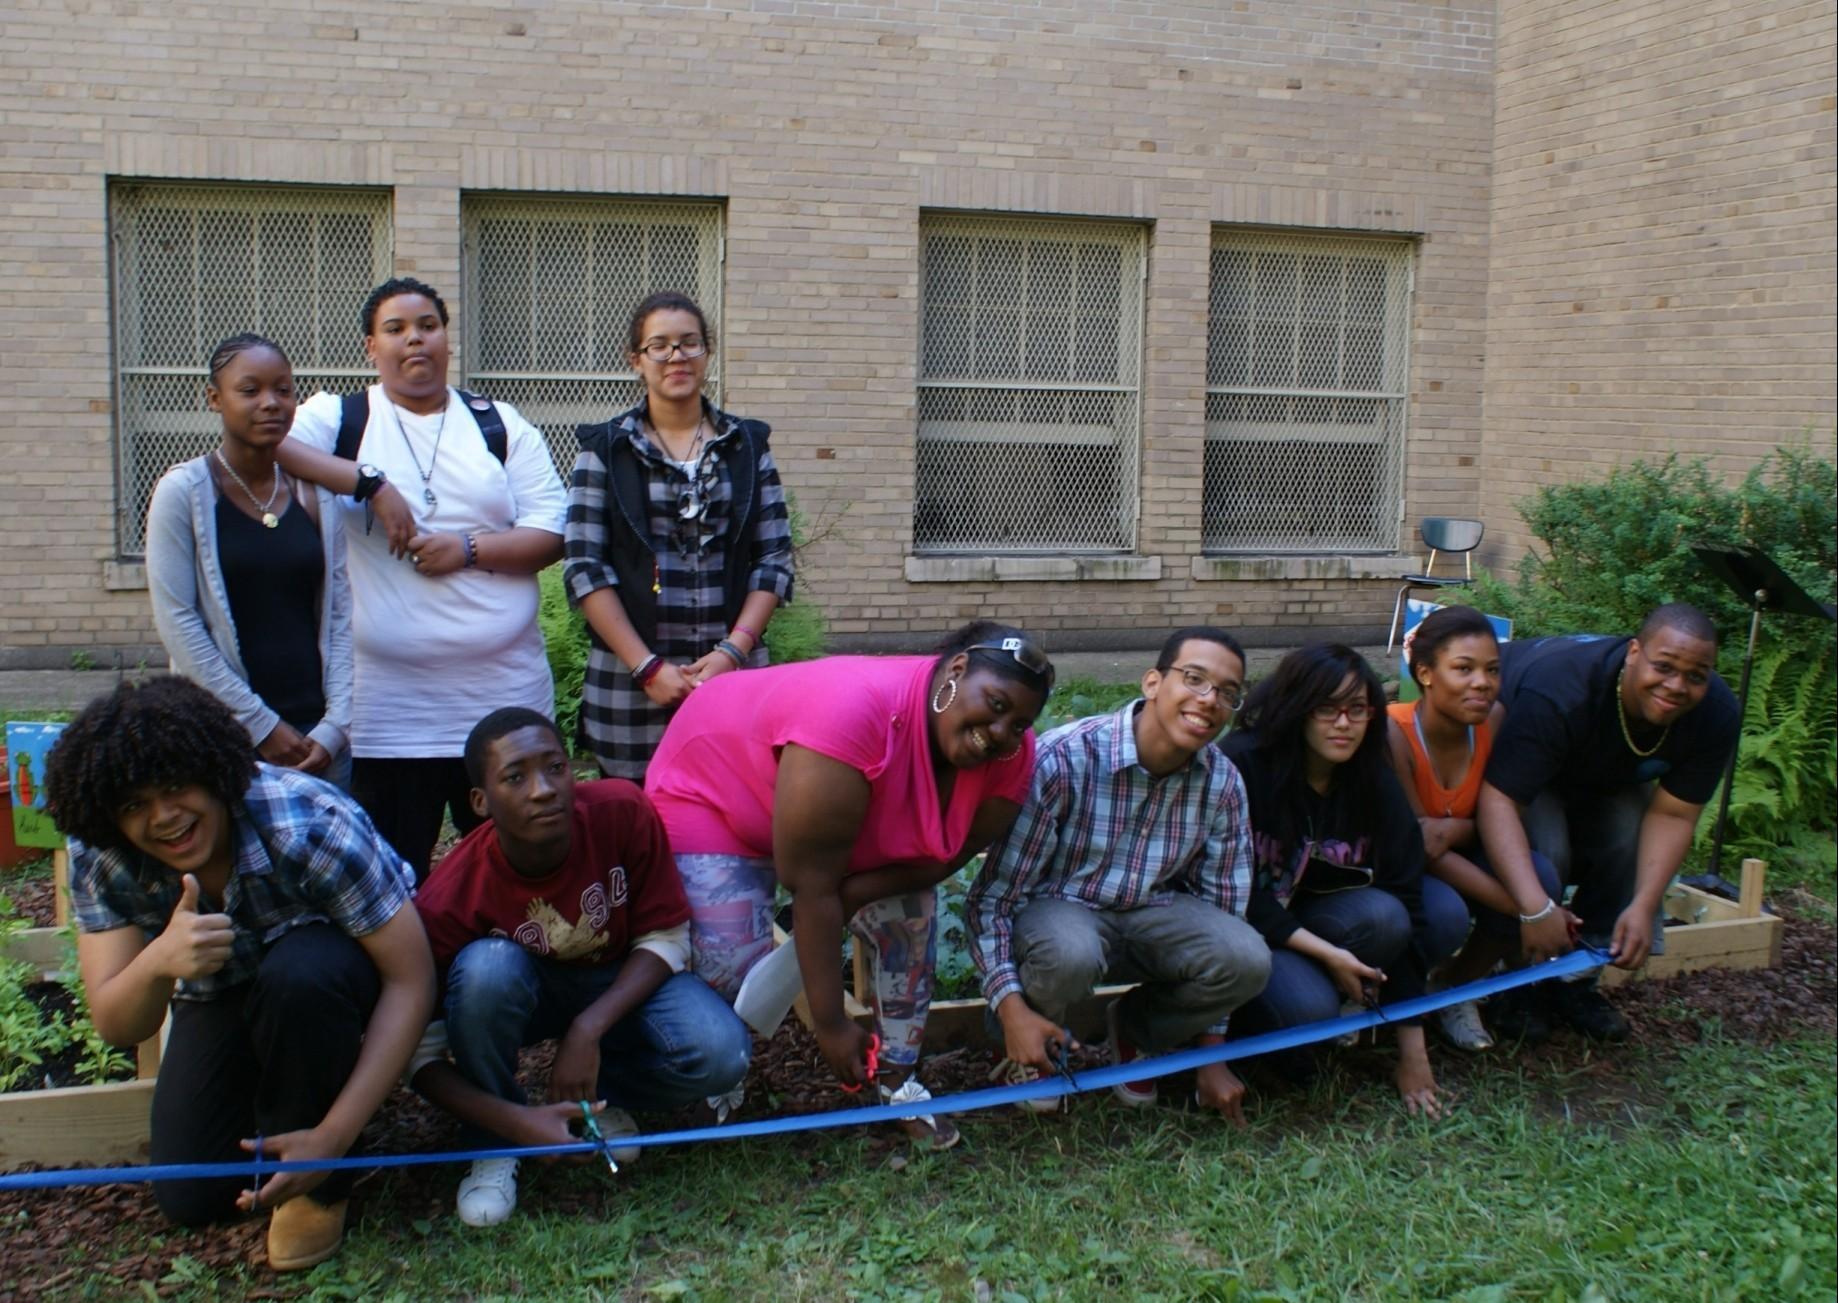 Fordham Students Garden 4 Good